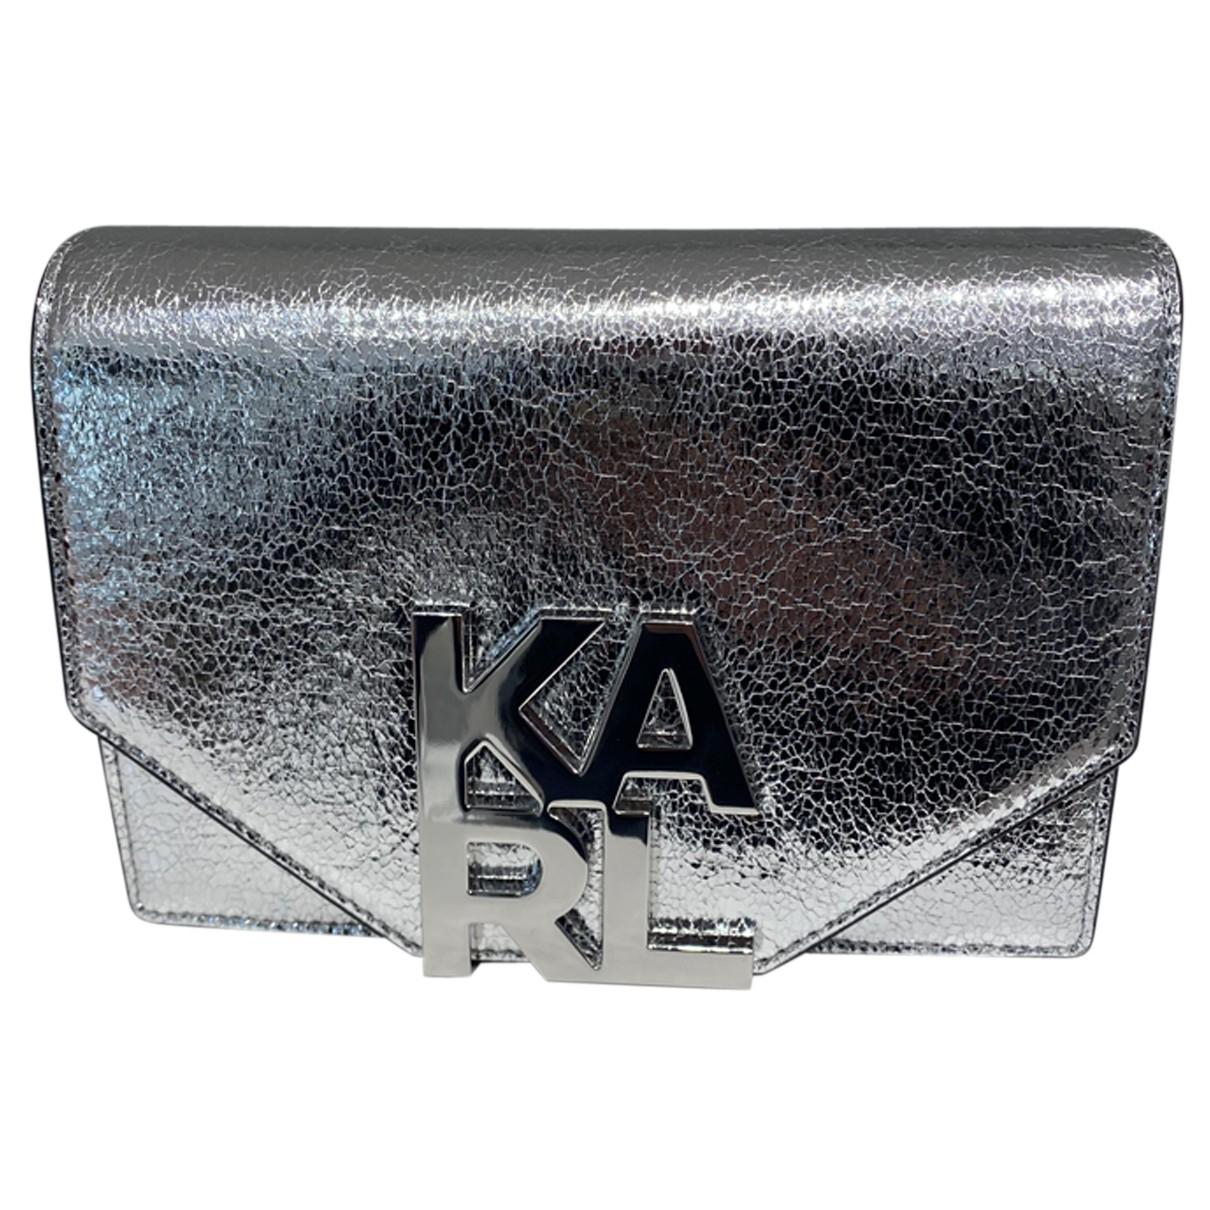 Karl Lagerfeld N Silver Leather Clutch bag for Women N